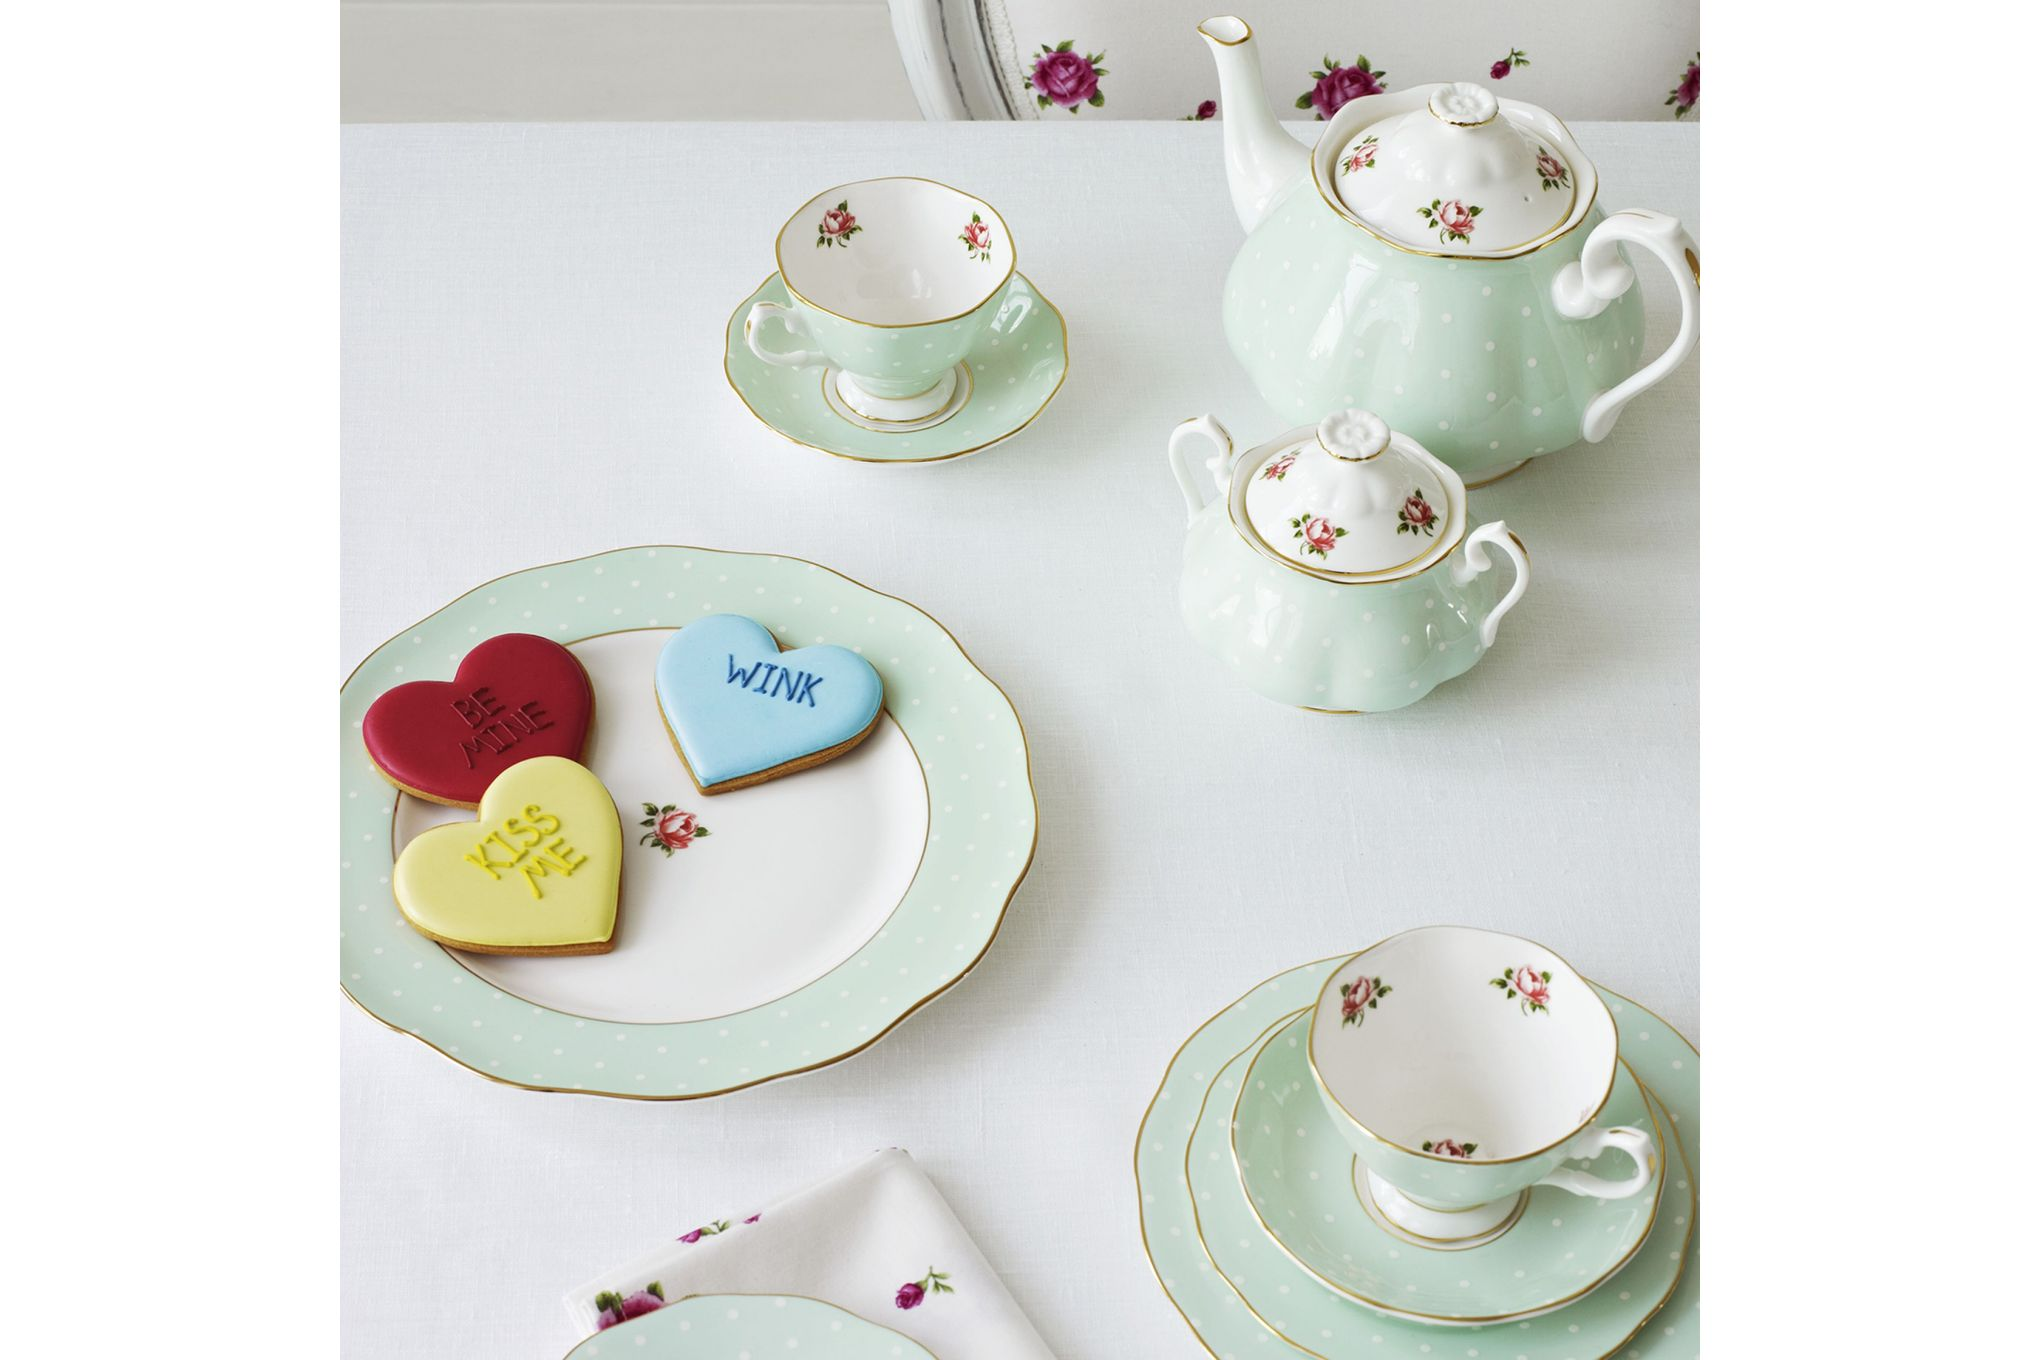 Royal Albert Polka Rose 3 Piece Tea set Teapot, Sugar Bowl and Creamer - Polka Rose thumb 2